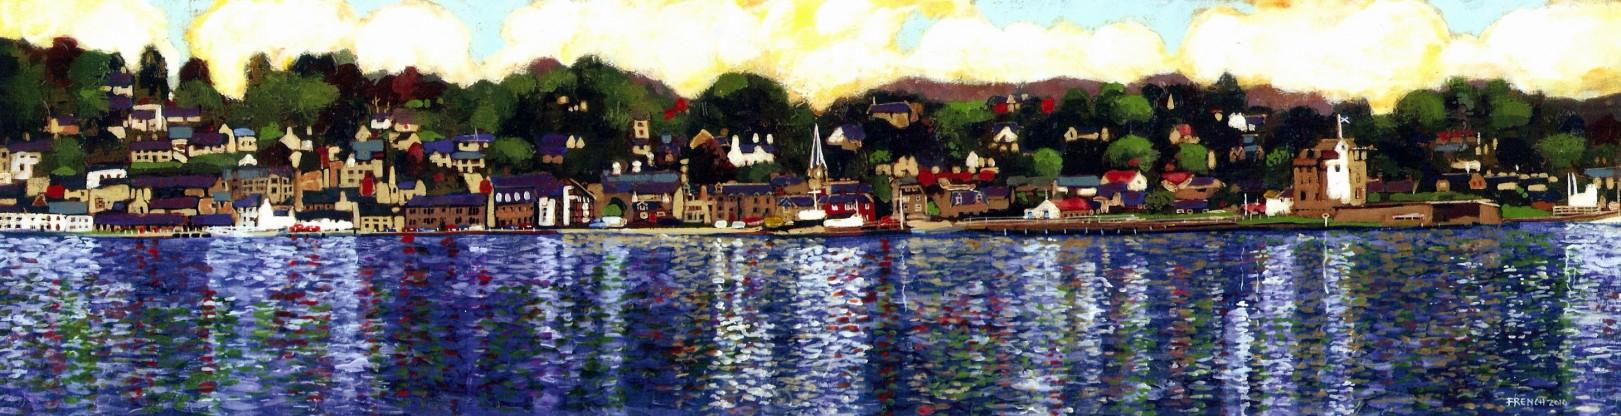 Stephen French_Broughty Ferry (Choppy)_14.5x3.75_40